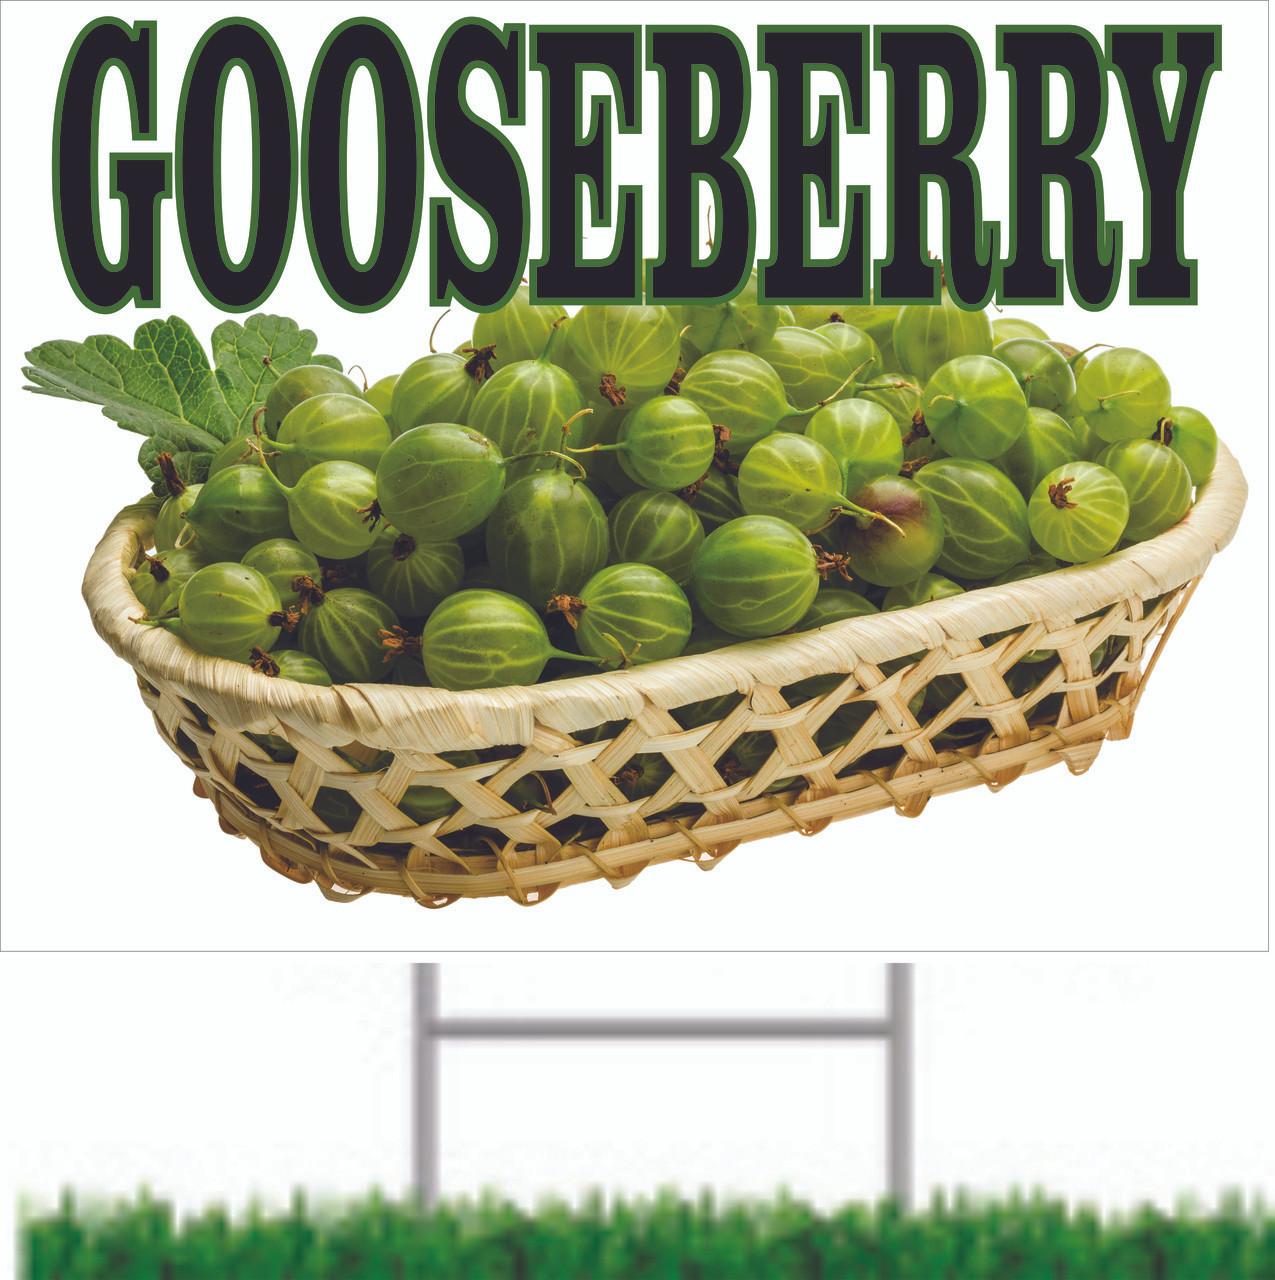 Gooseberry Road/Yard Sign